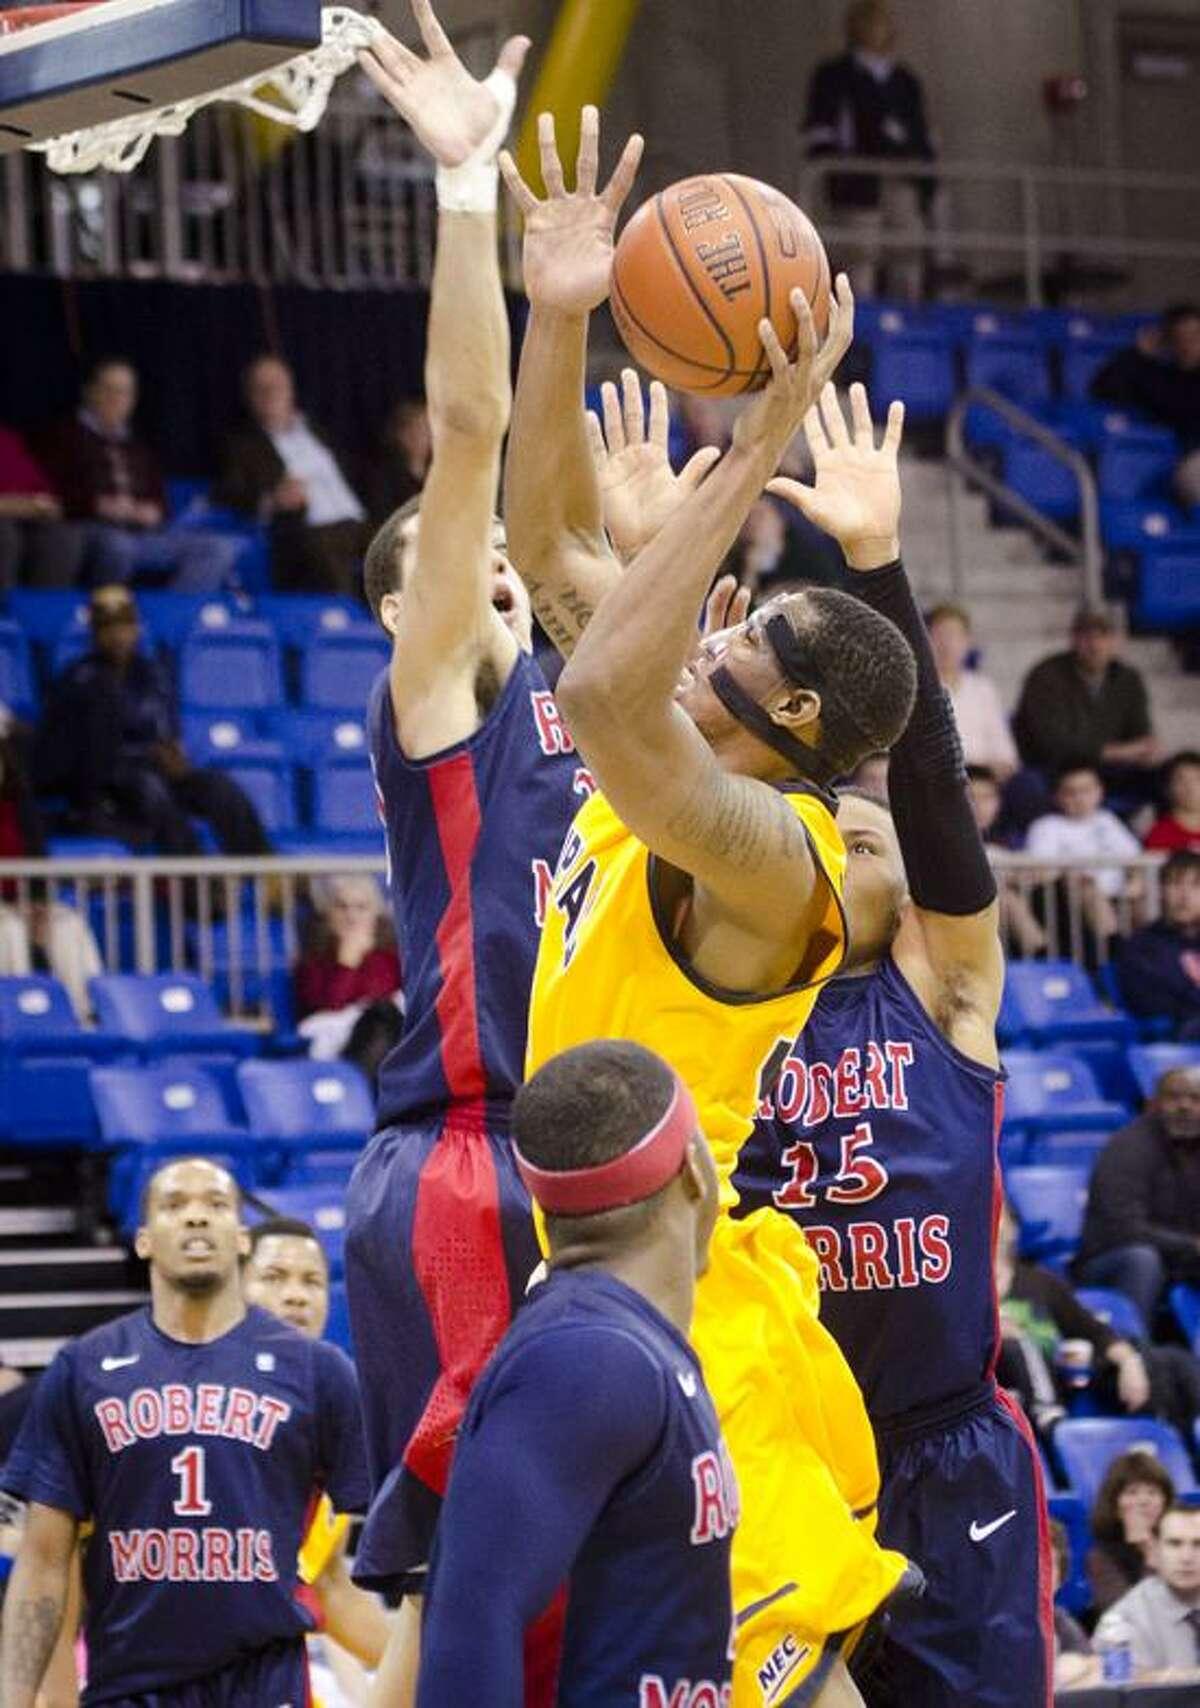 SPORTS-Quinnipiac vs. Morris Basketball Quinnipiac's Jamee Jackson goes to the basket in 2nd half actionMelanie Stengel/Register2/14/13